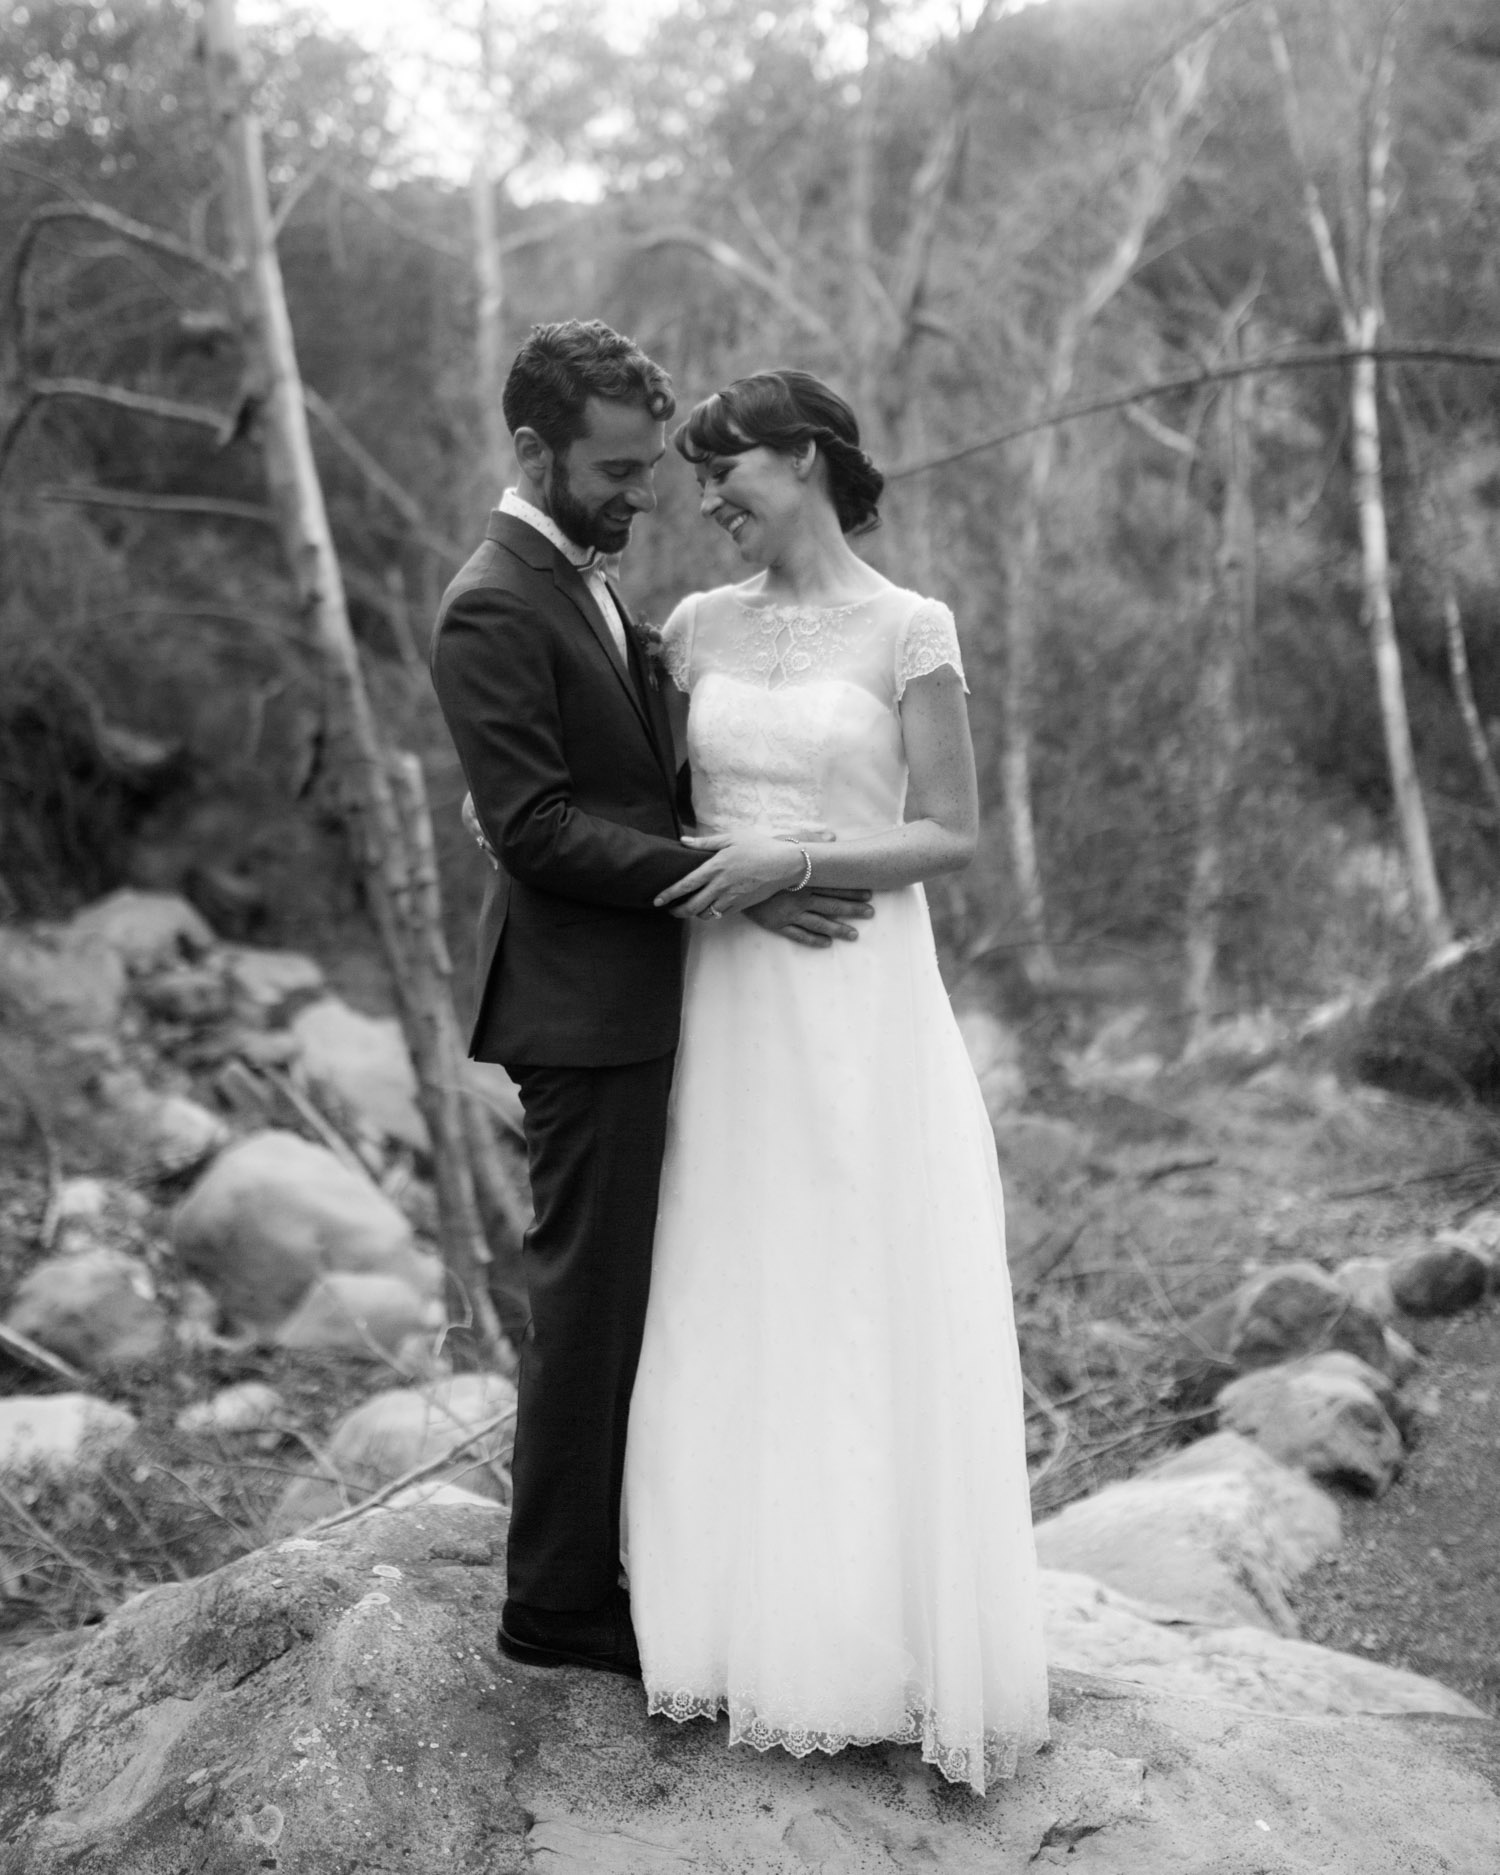 Ojai Wedding Photographer, Calliote Canyon Wedding - The Gathering Season x weareleoandkat 067.JPG